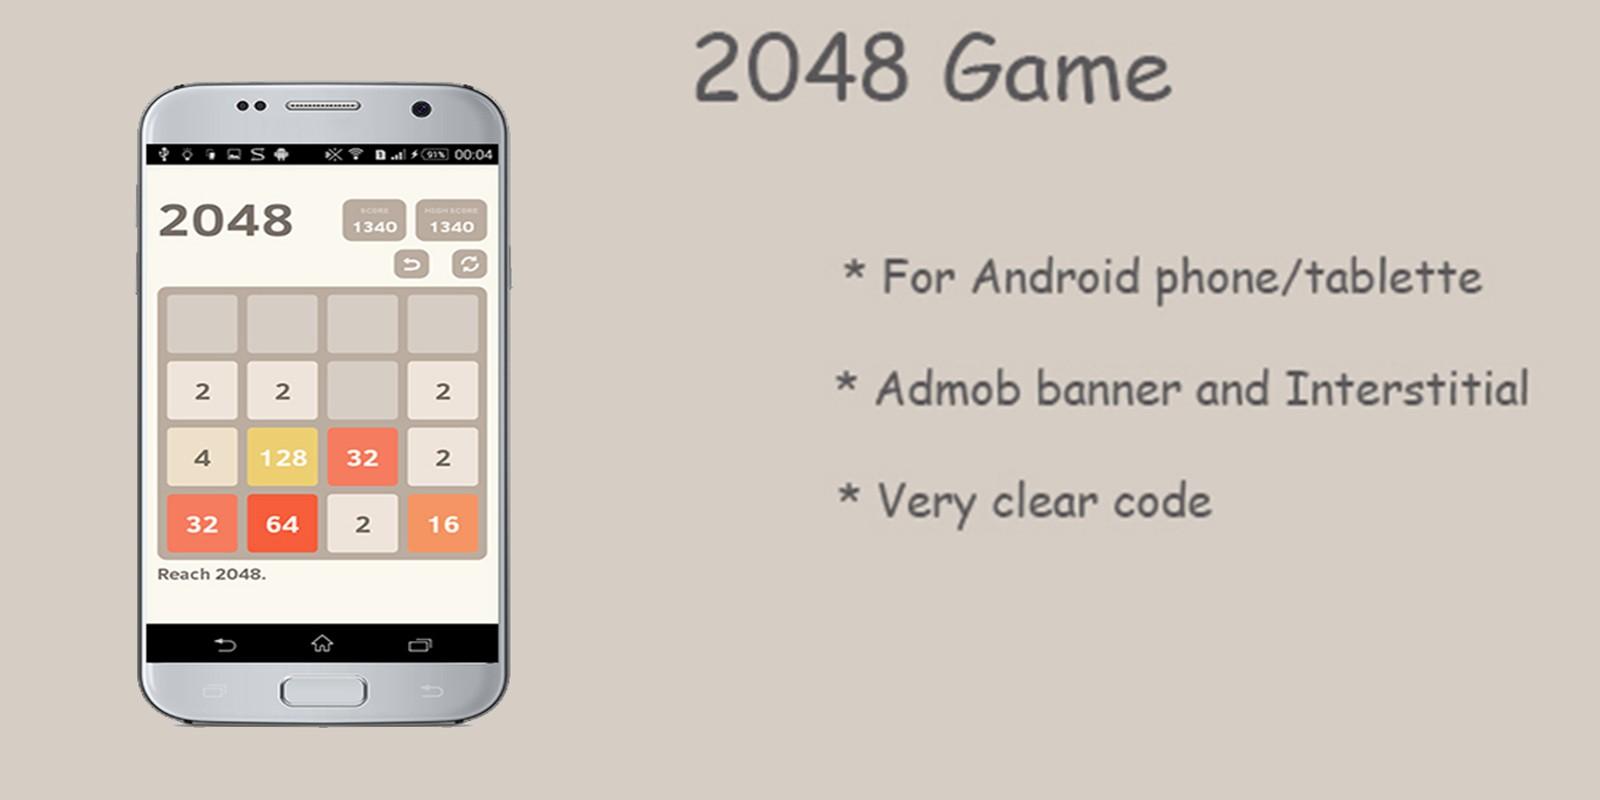 2048 unity source code